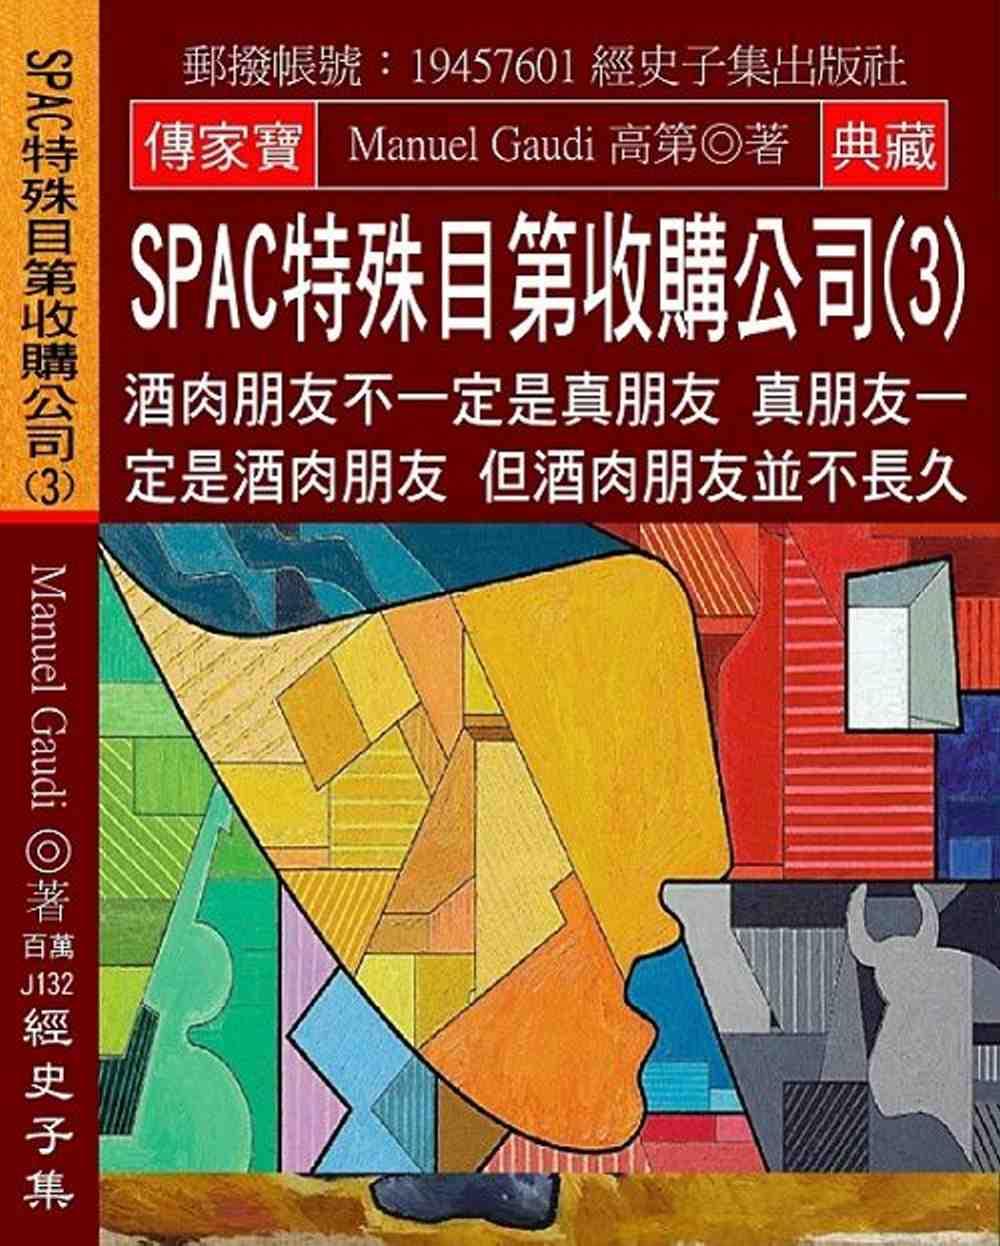 SPAC特殊目第收購公司(3)...